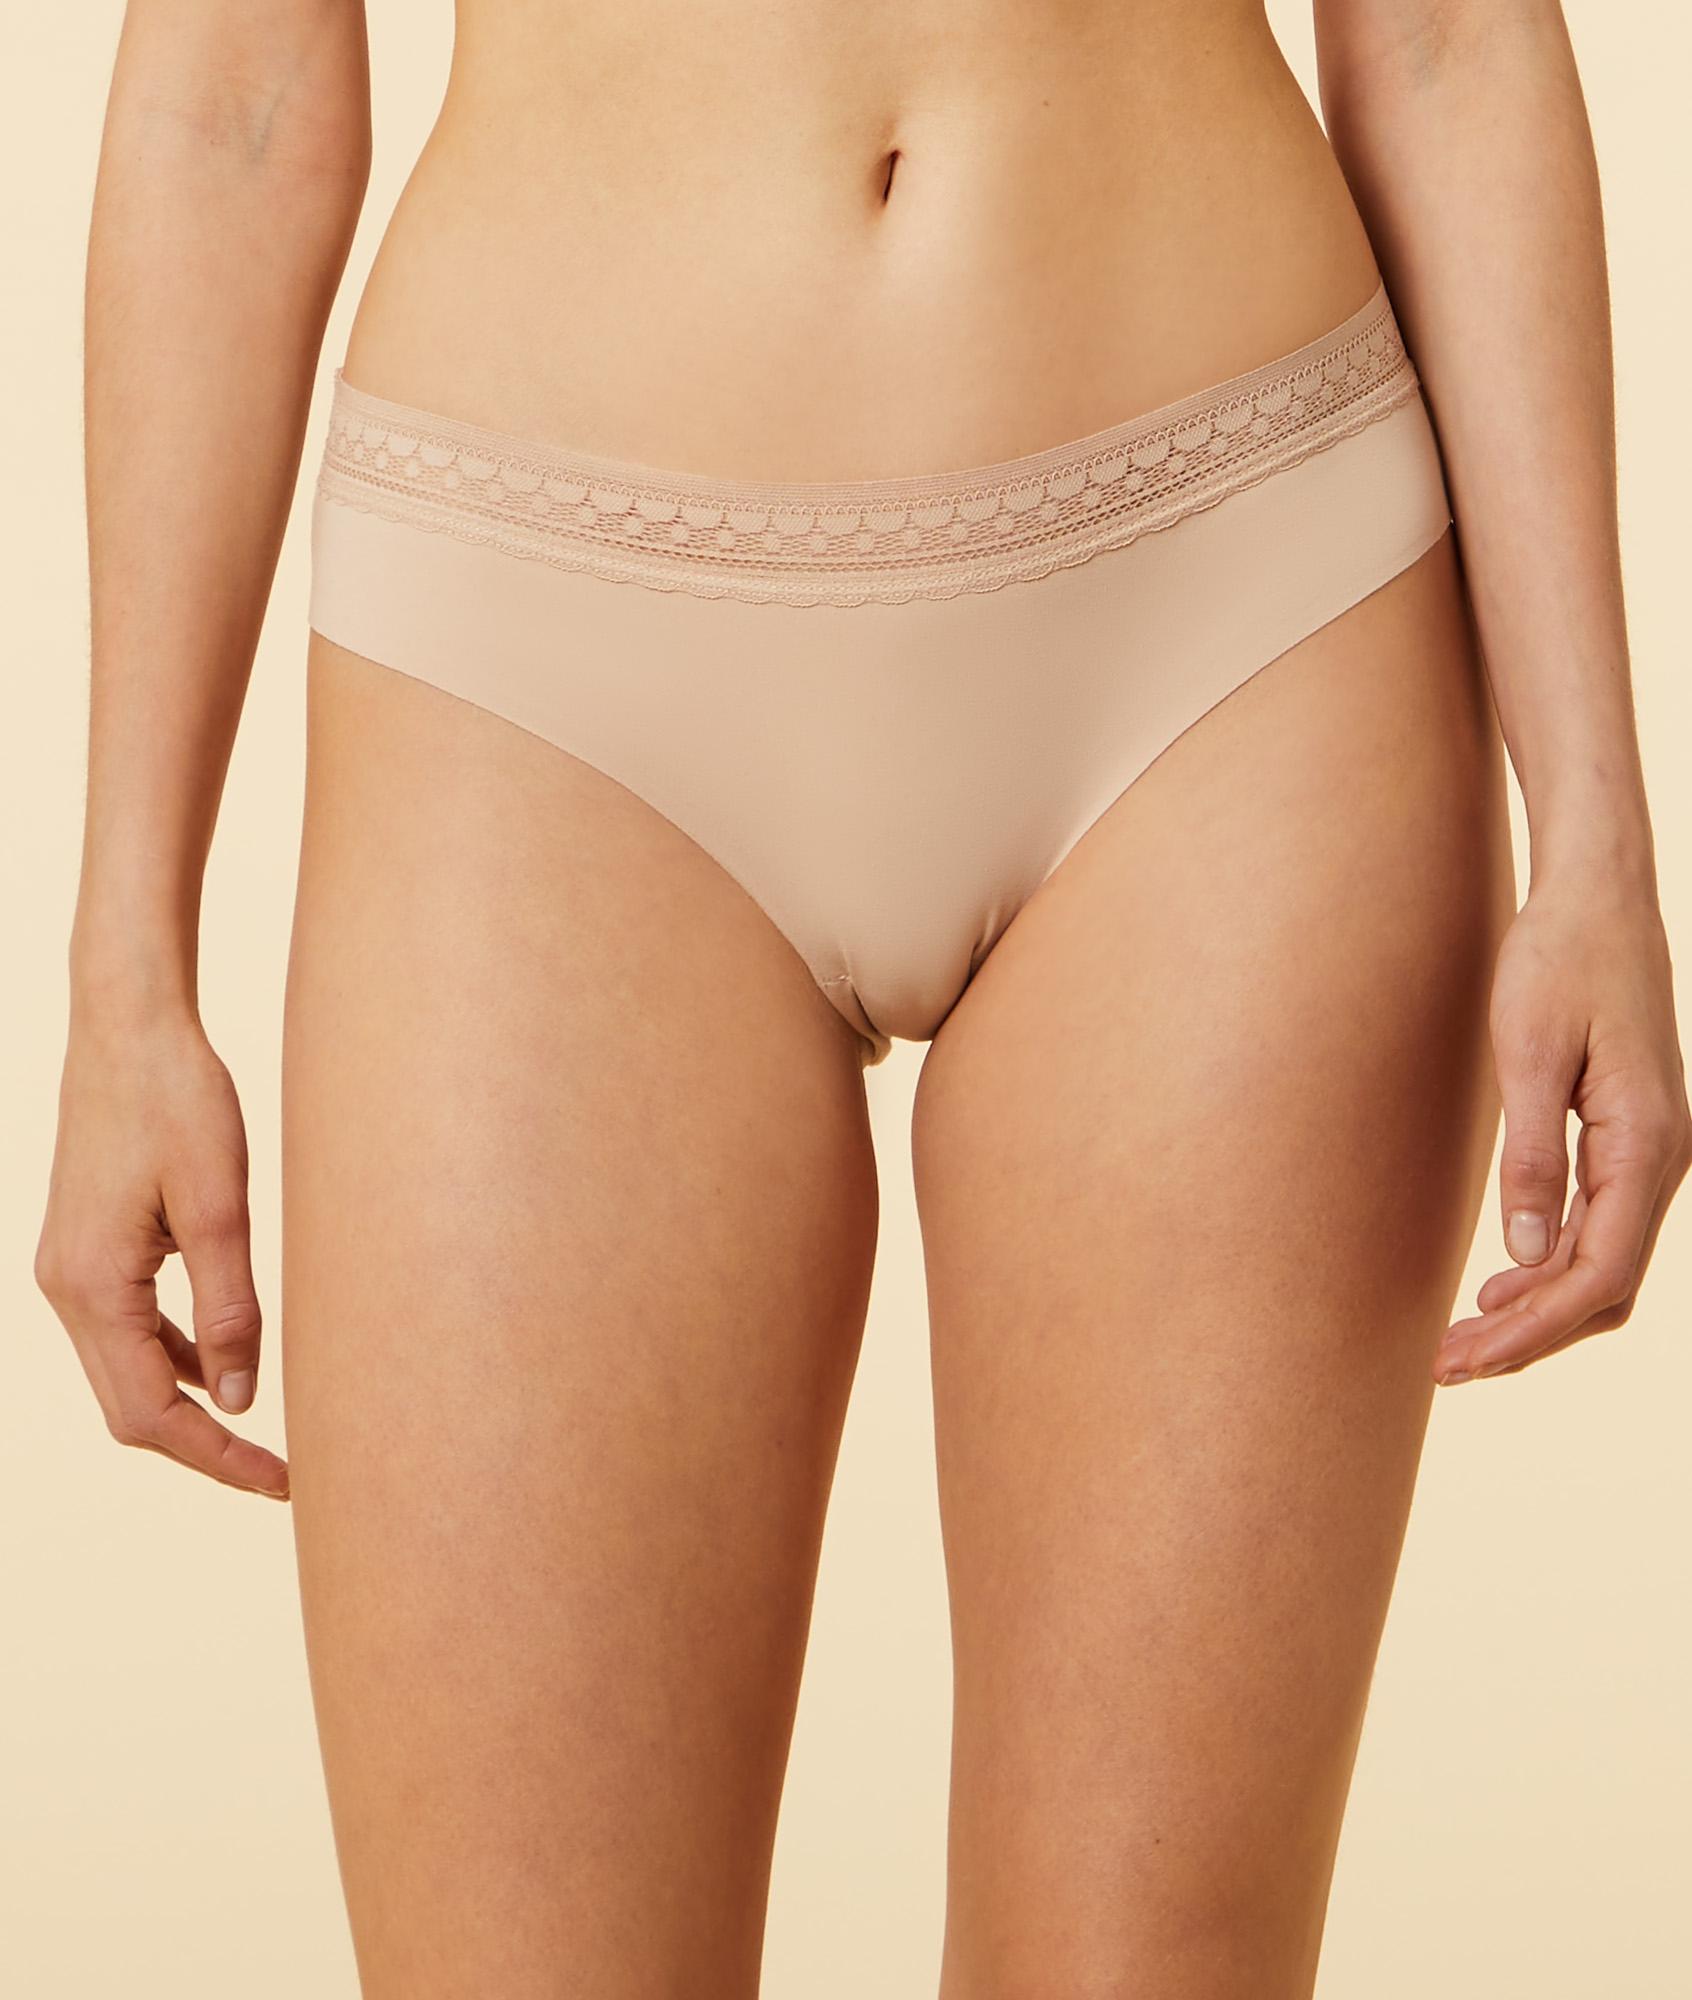 Lady de Paris briefs shorty//string knickers womens underwear clothing nightwear